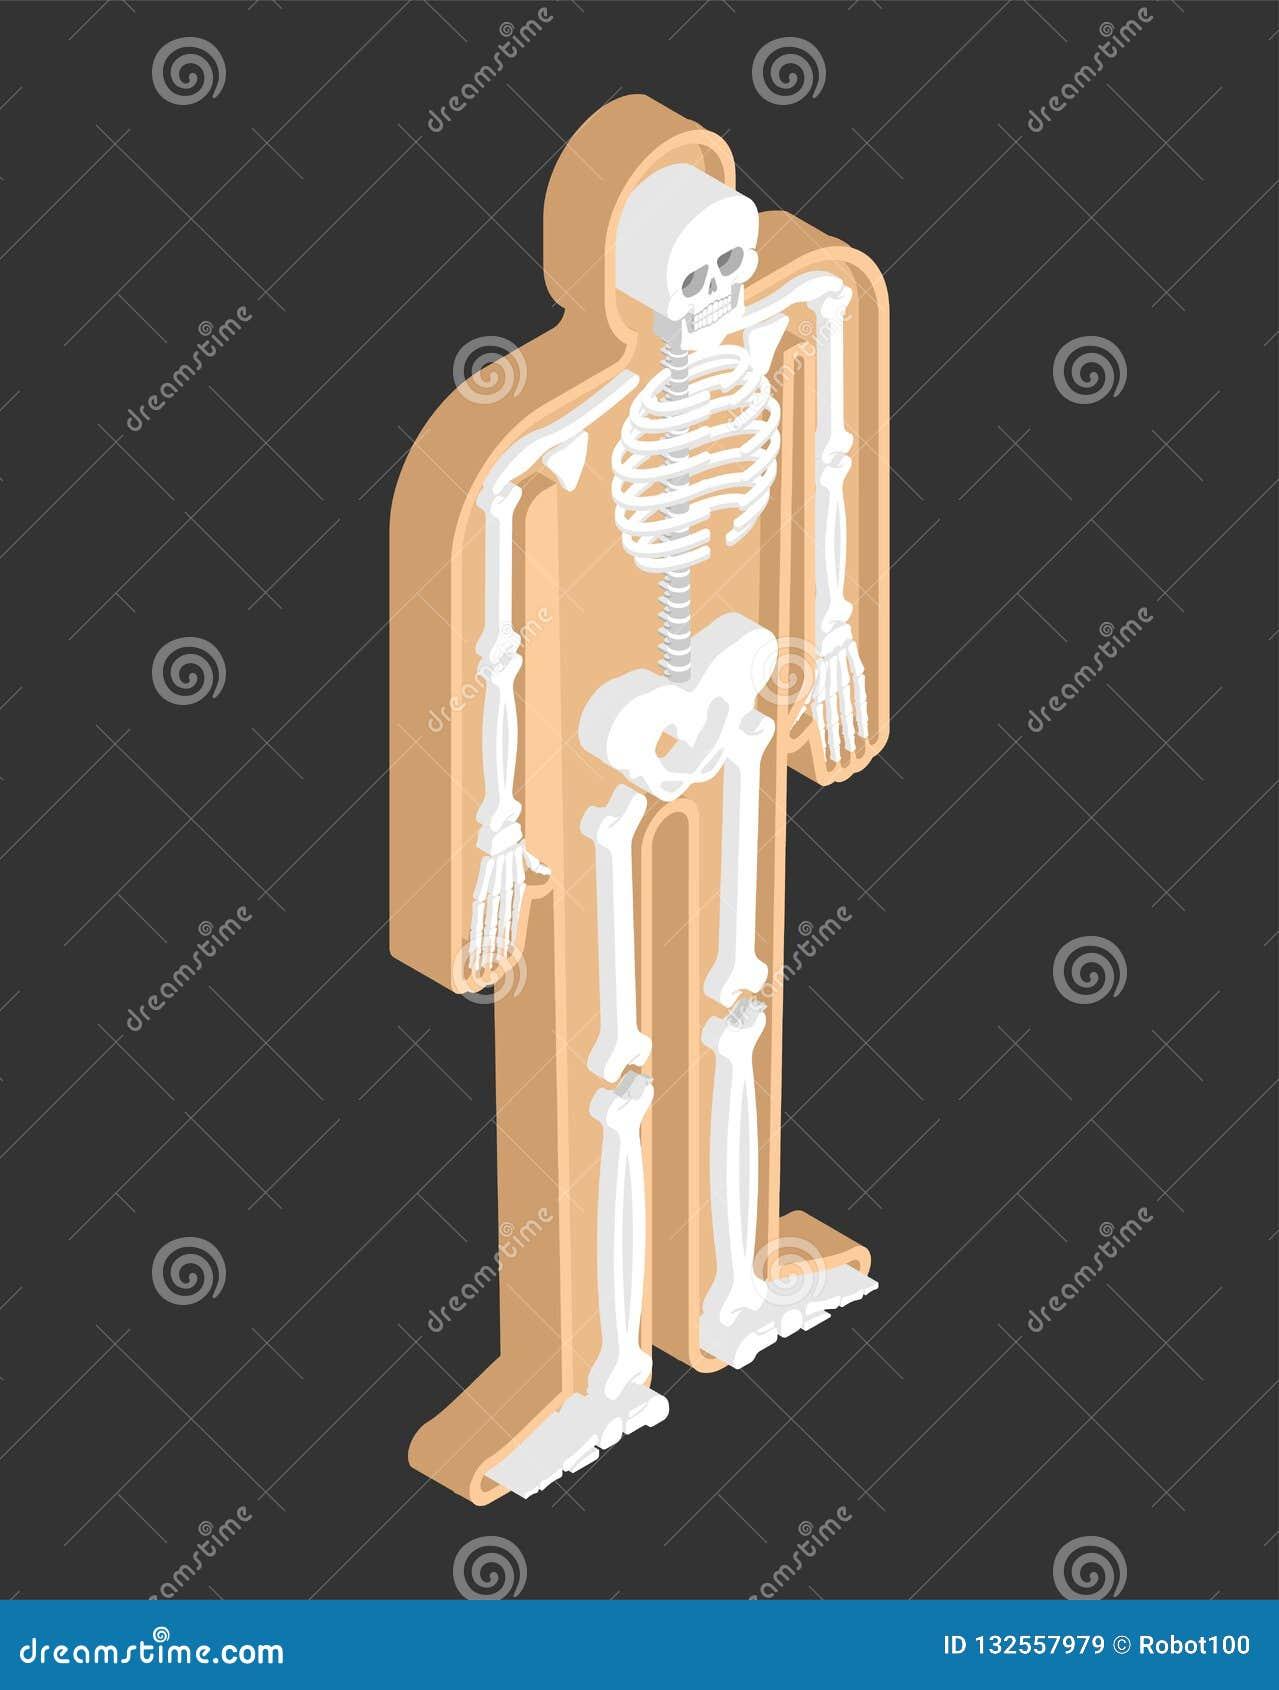 Skeleton Isometric Anatomy Of Human Body  Internal Organs 3D